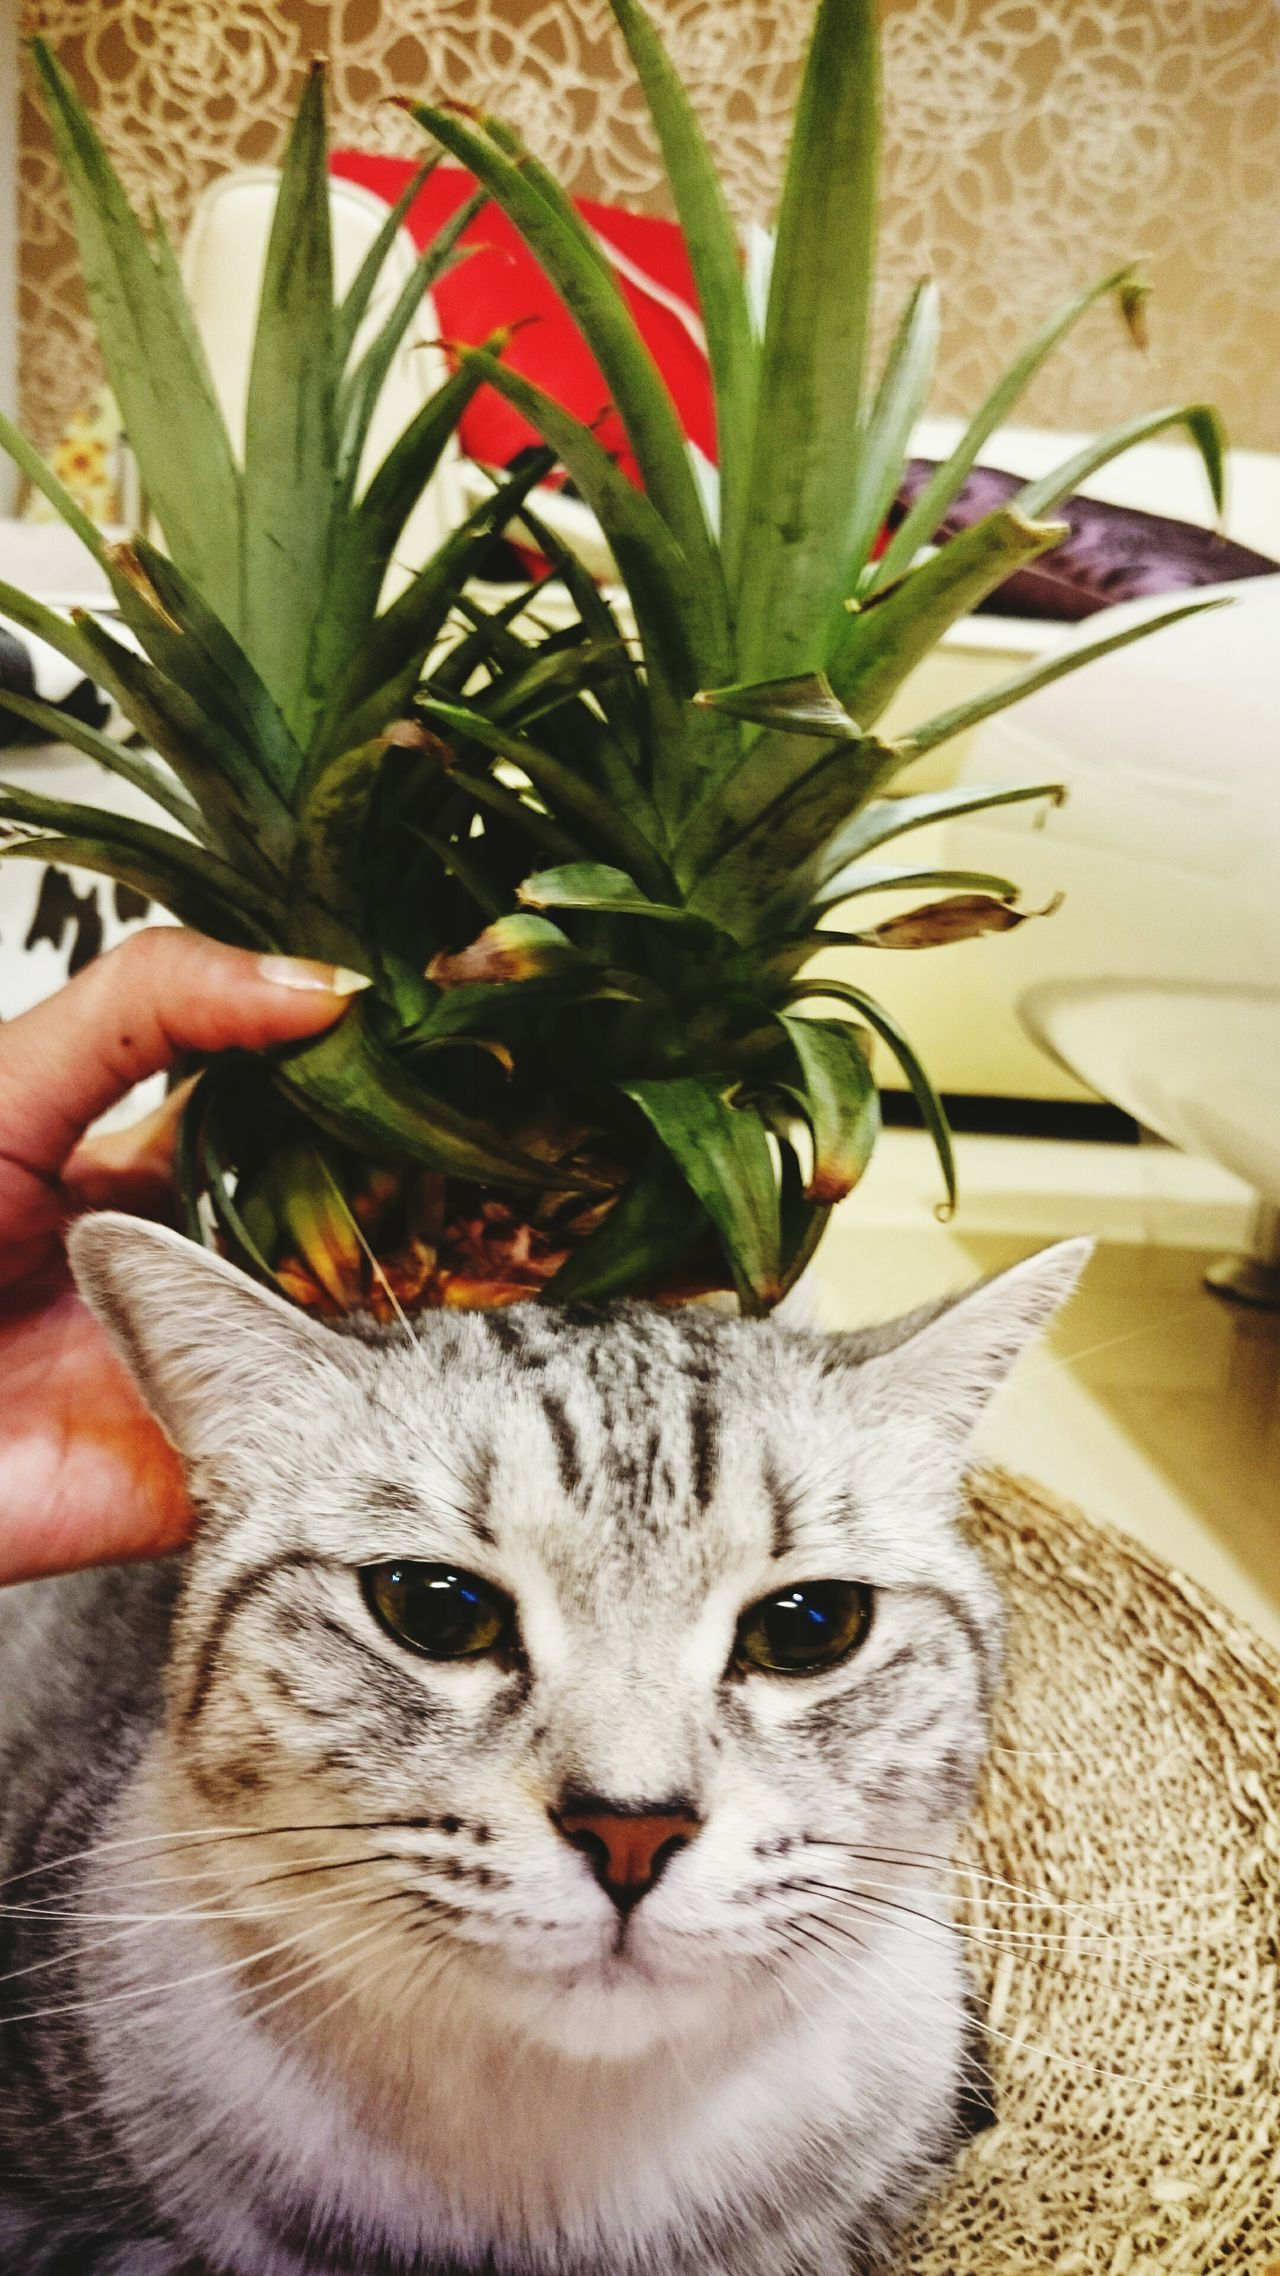 Ananas Pineapple 鳳梨 貓 猫 Cat Kawai Pet Cute♡ ねこ 🍍🍍🍍🍍🍍🍍